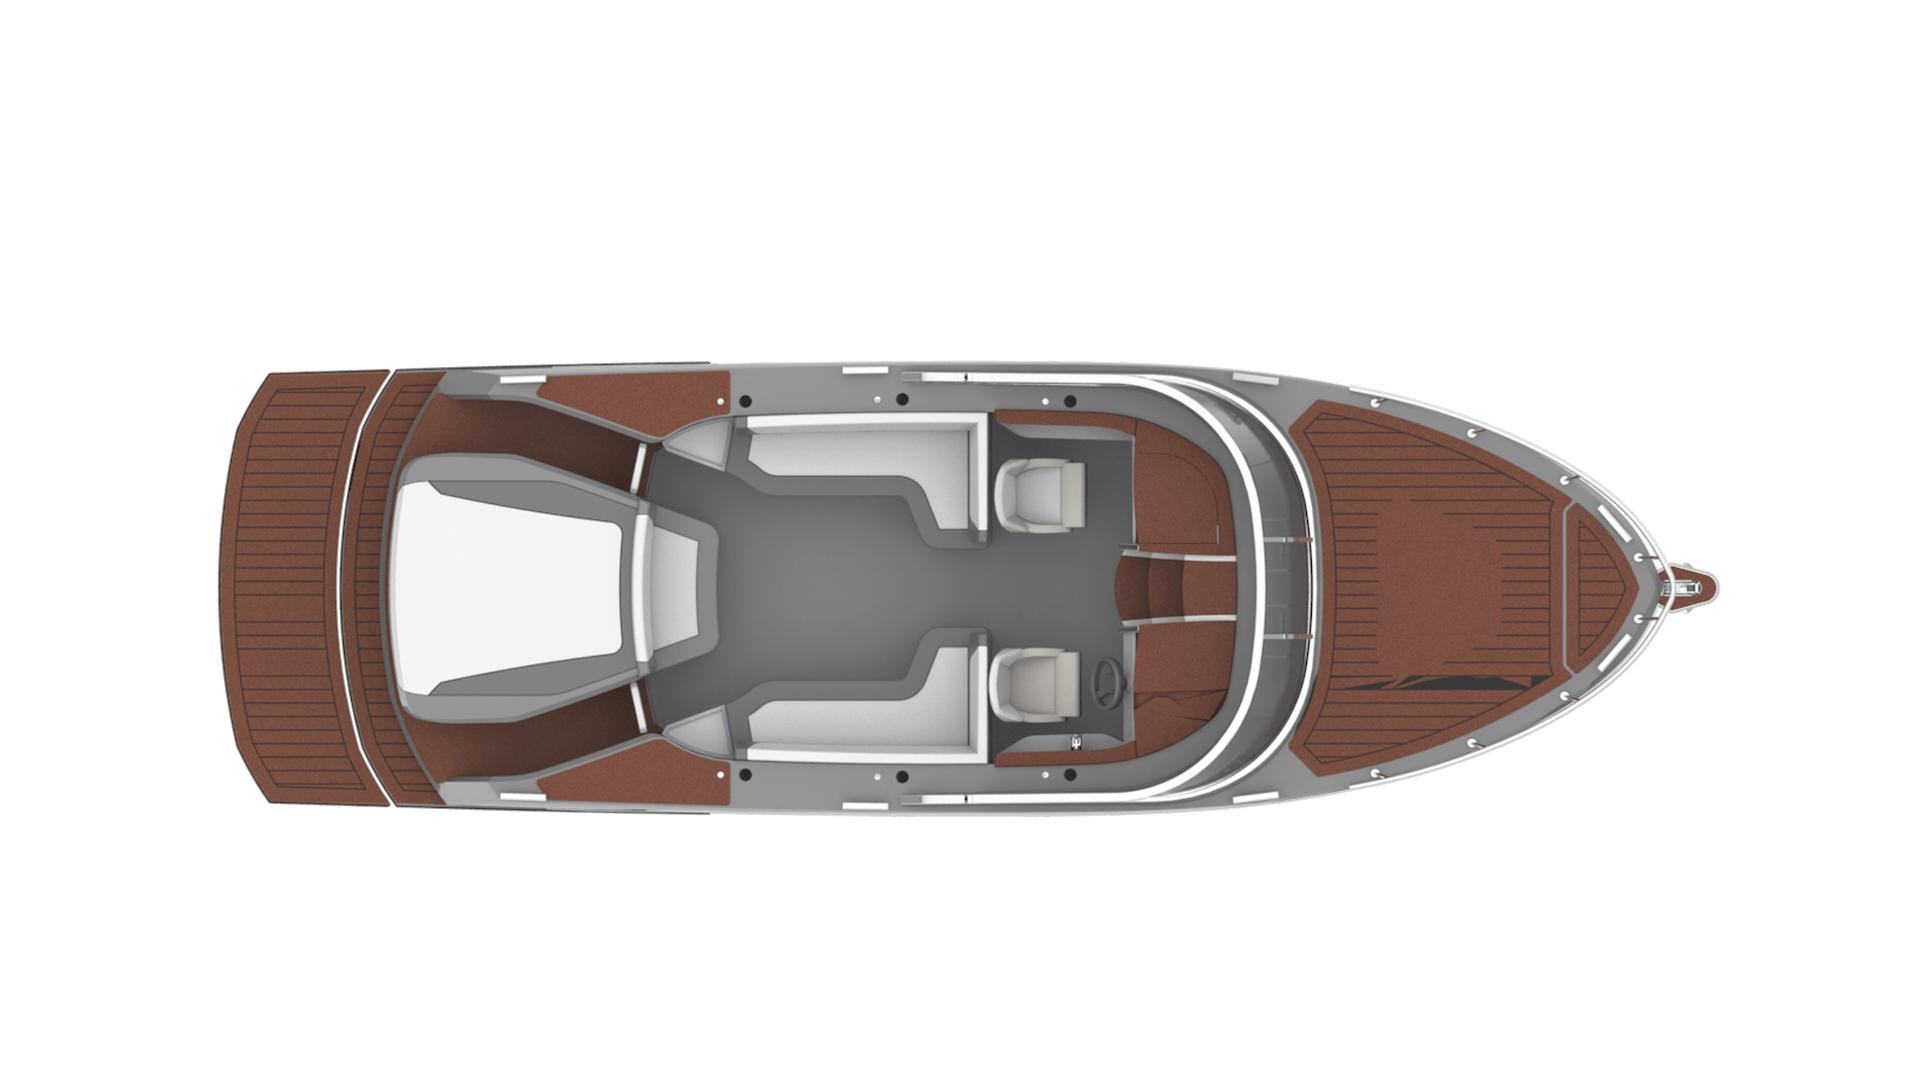 Motorboot yacht typen